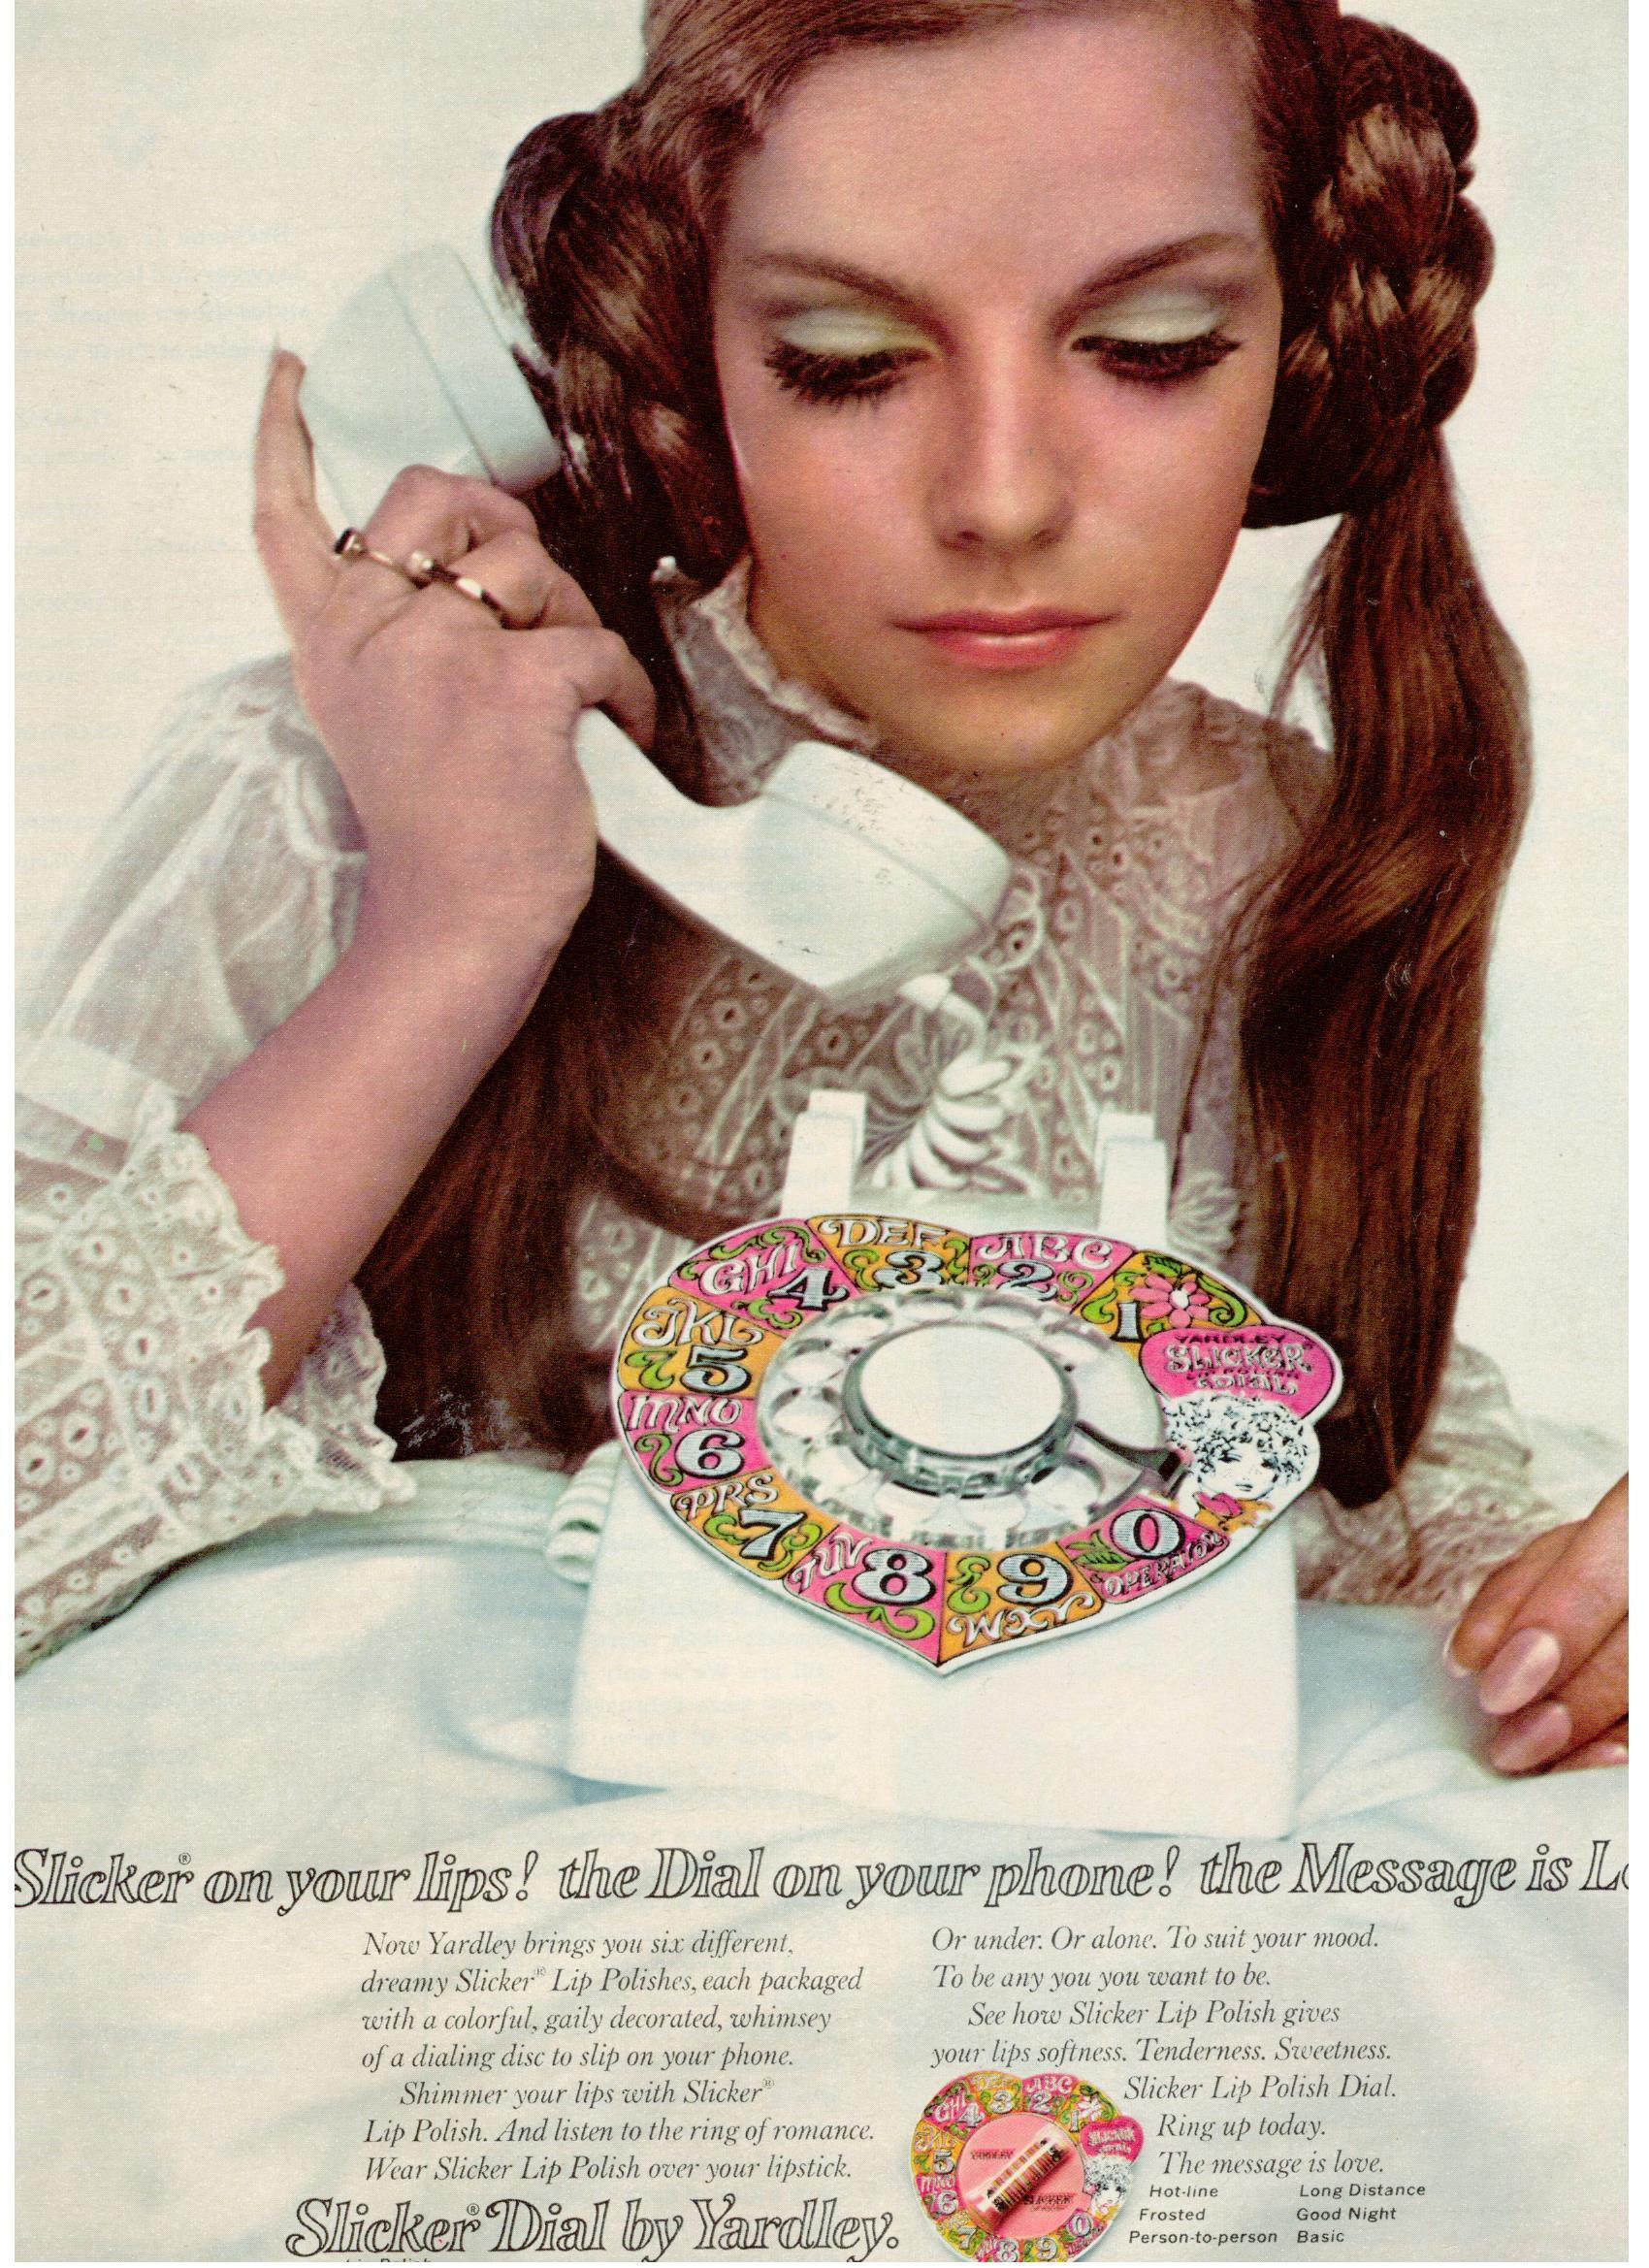 1968 Patsy Sullivan. yardley-of-london Slicker